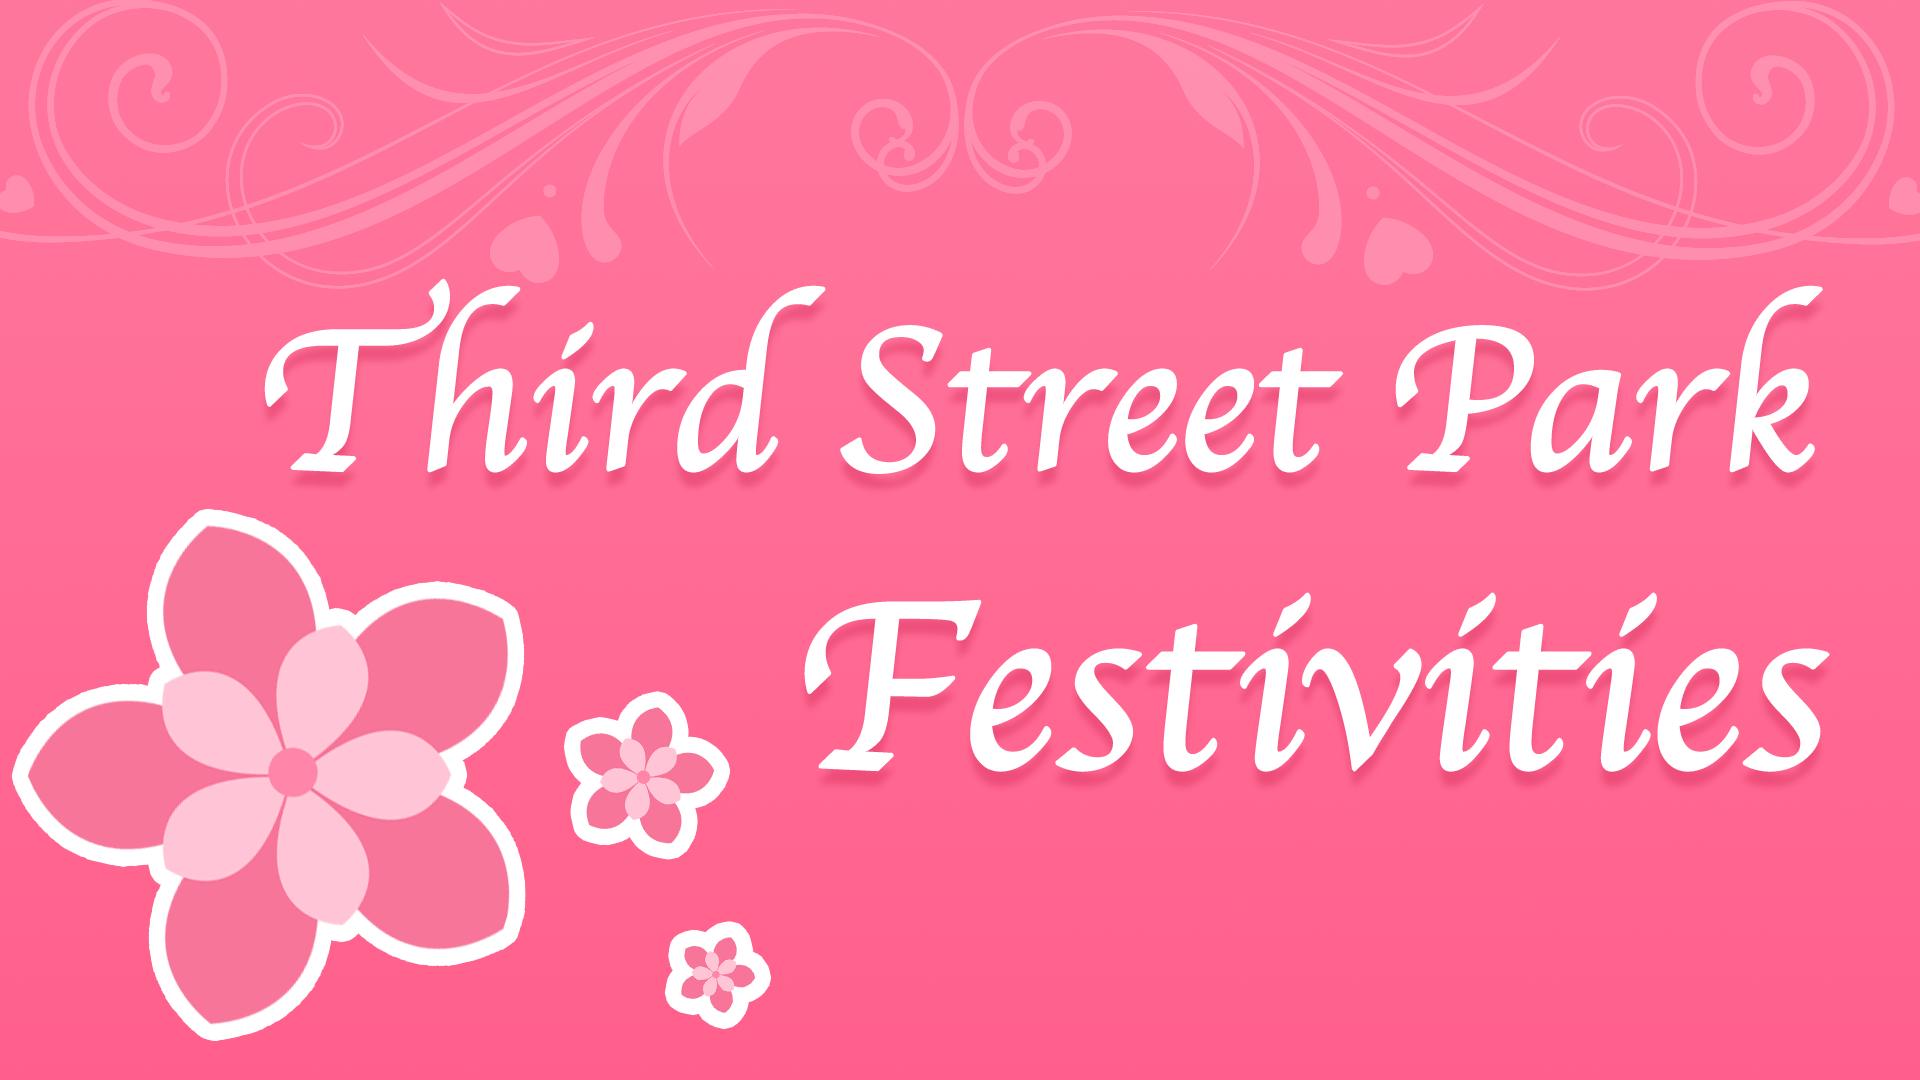 Third Street Park Activities